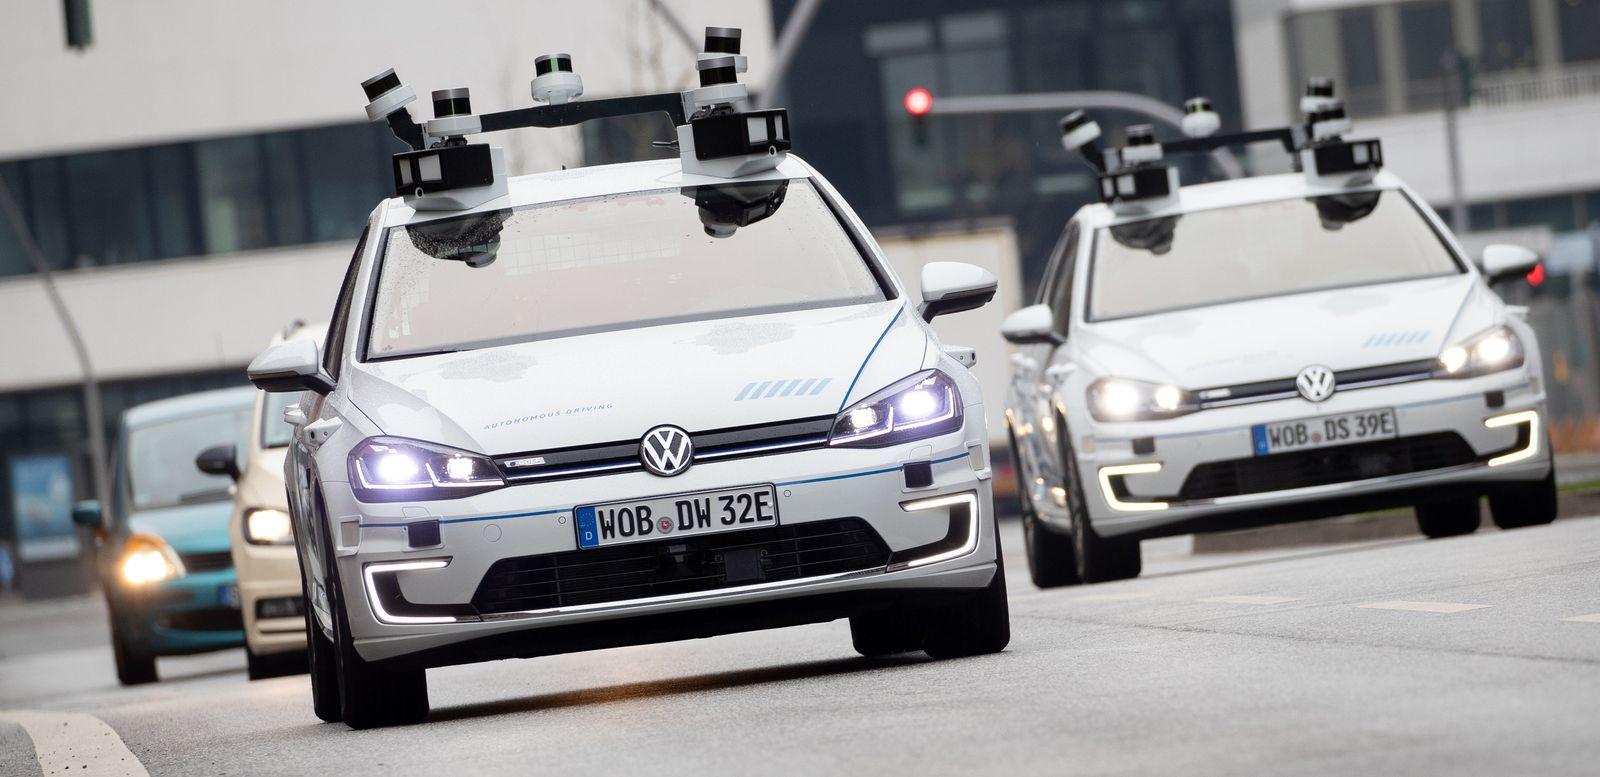 Volkswagen erprobt autonomes Fahren